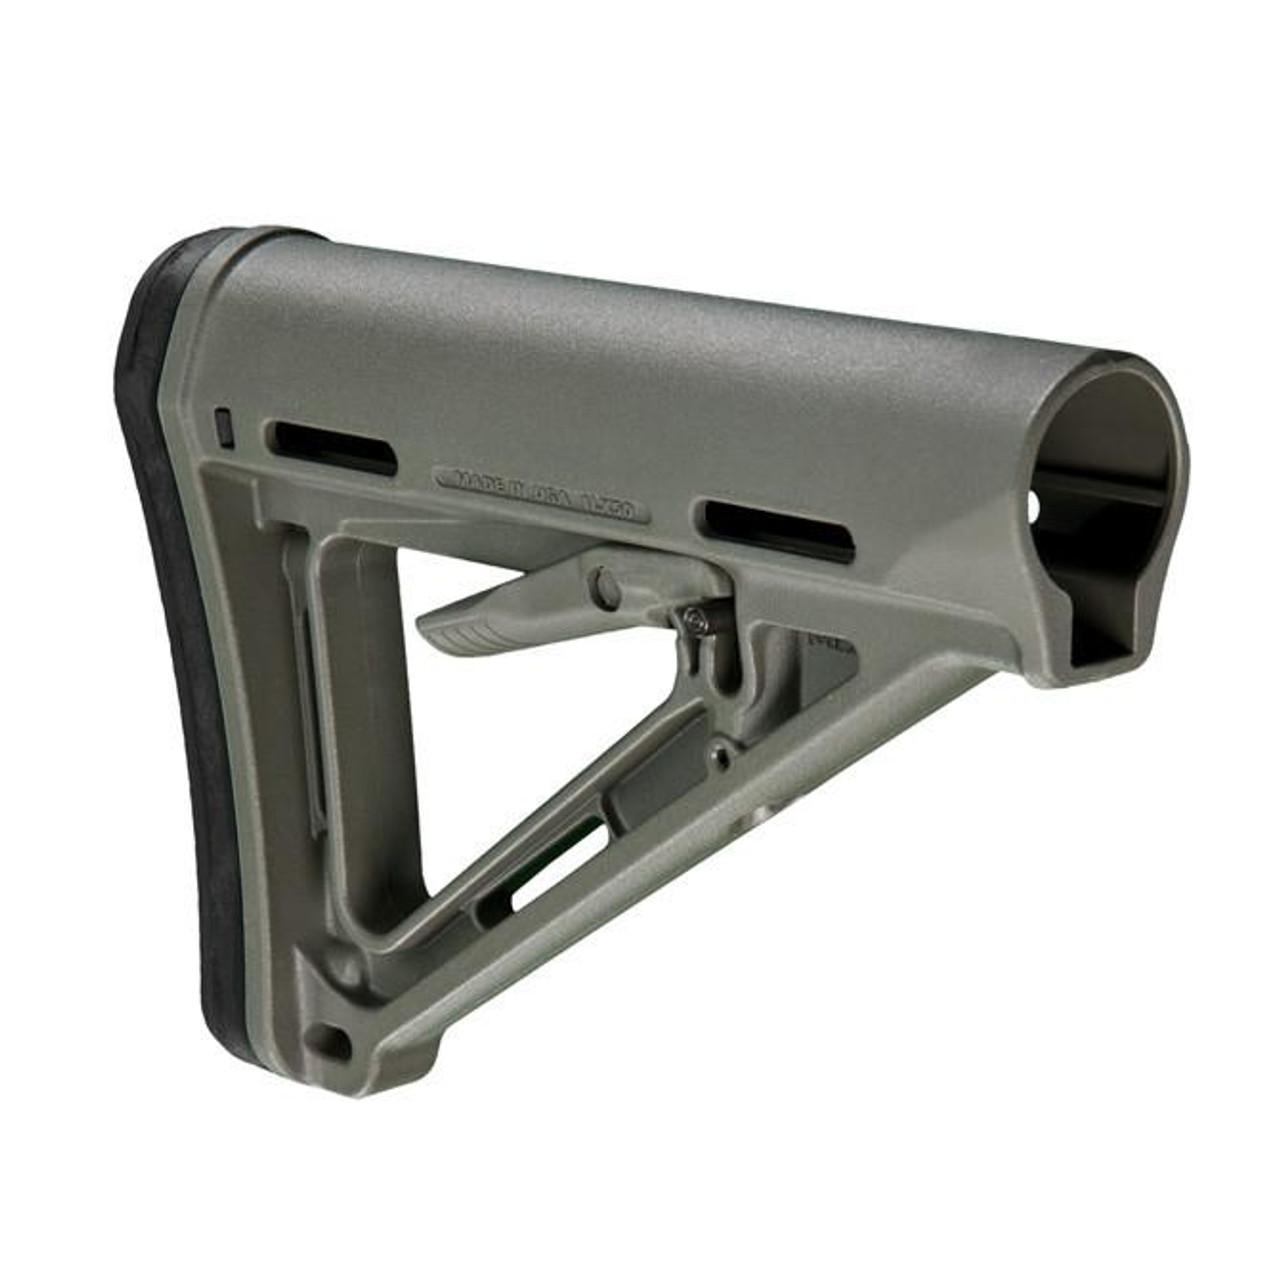 MAGPUL MOE Carbine Stock – Commercial-Spec Model